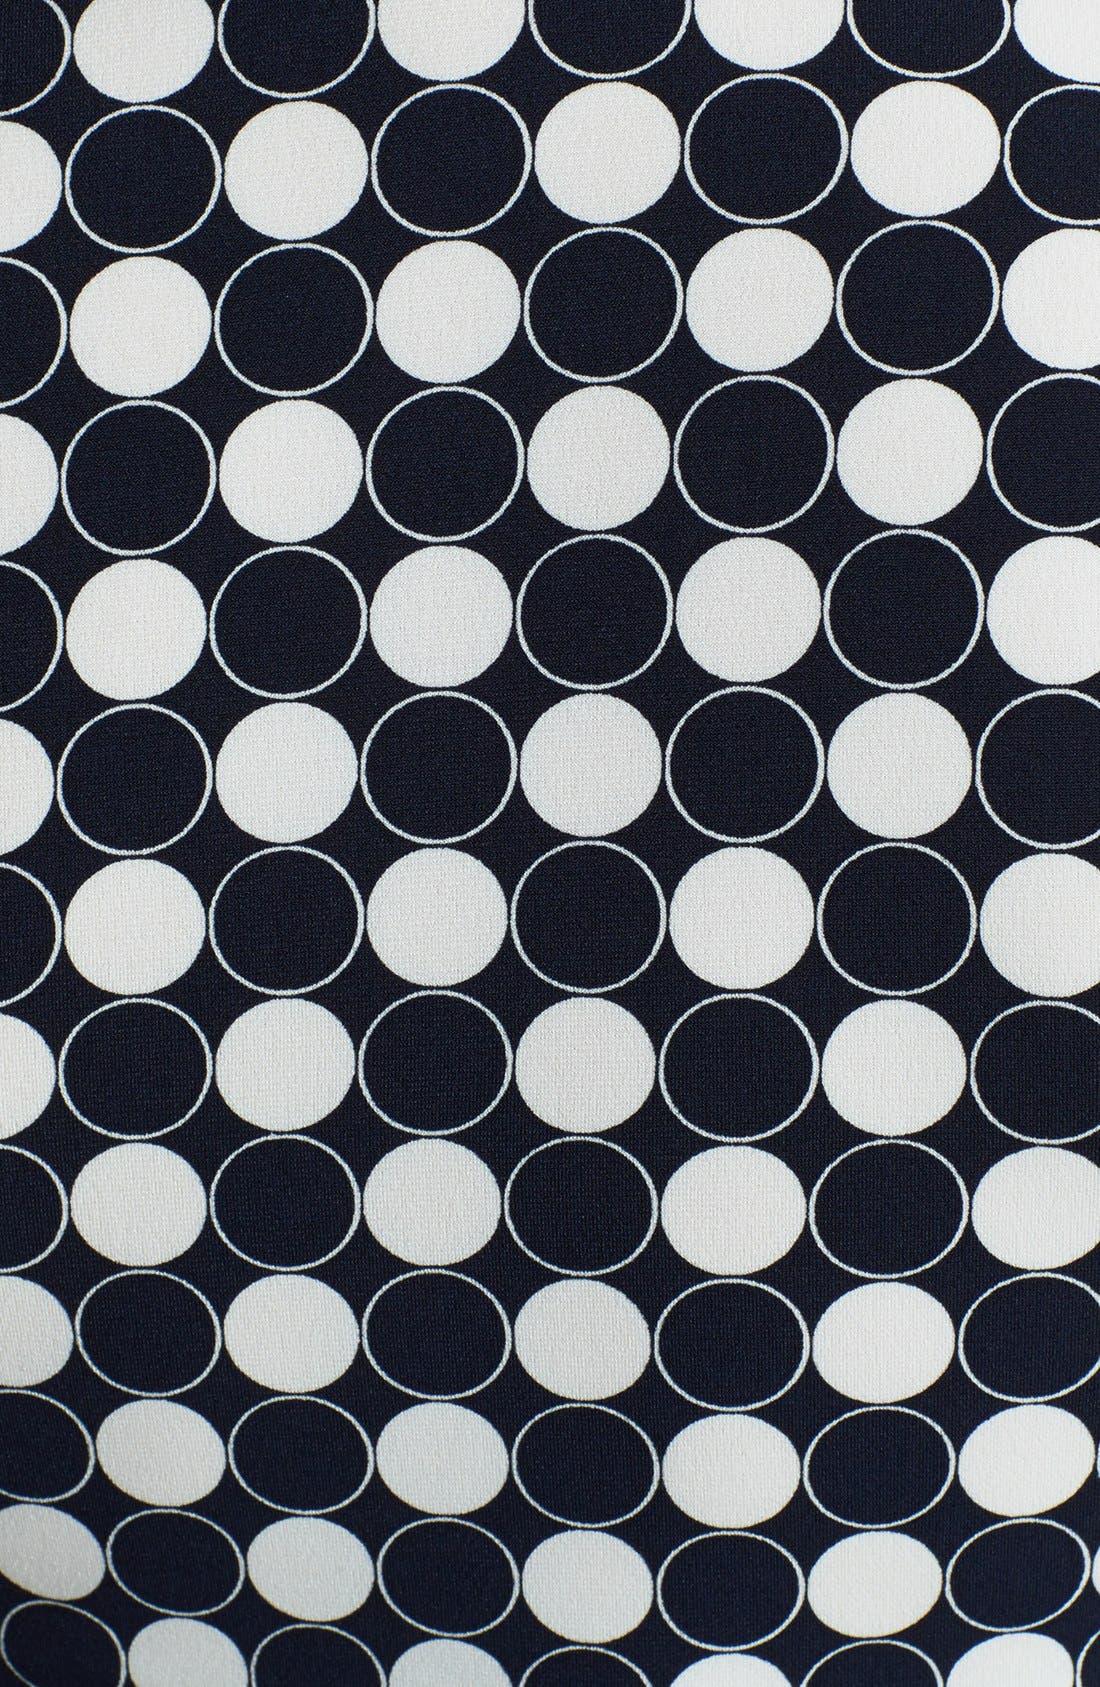 Alternate Image 3  - Vince Camuto 'Retro Dots' V-Neck Top (Regular & Petite)